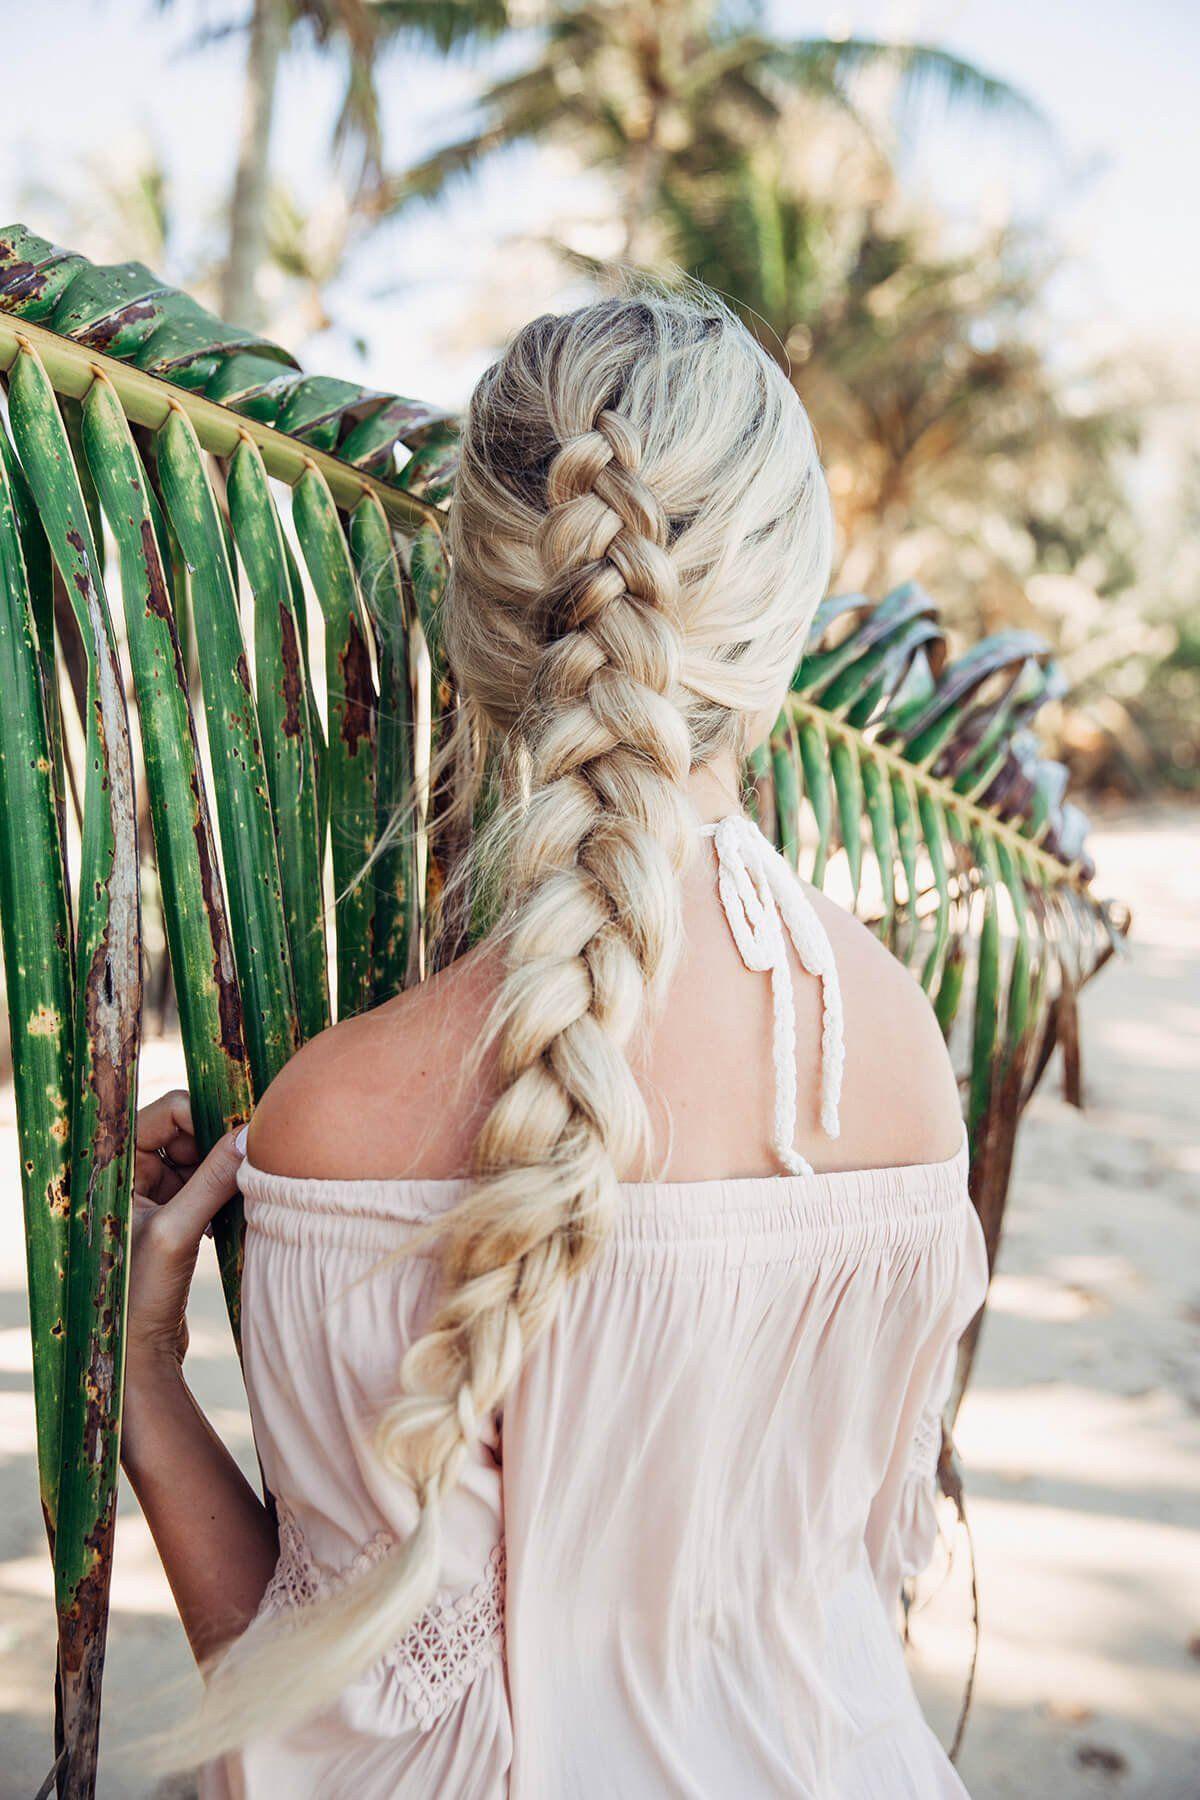 Hair Inspiration 2019-04-01 19:11:59